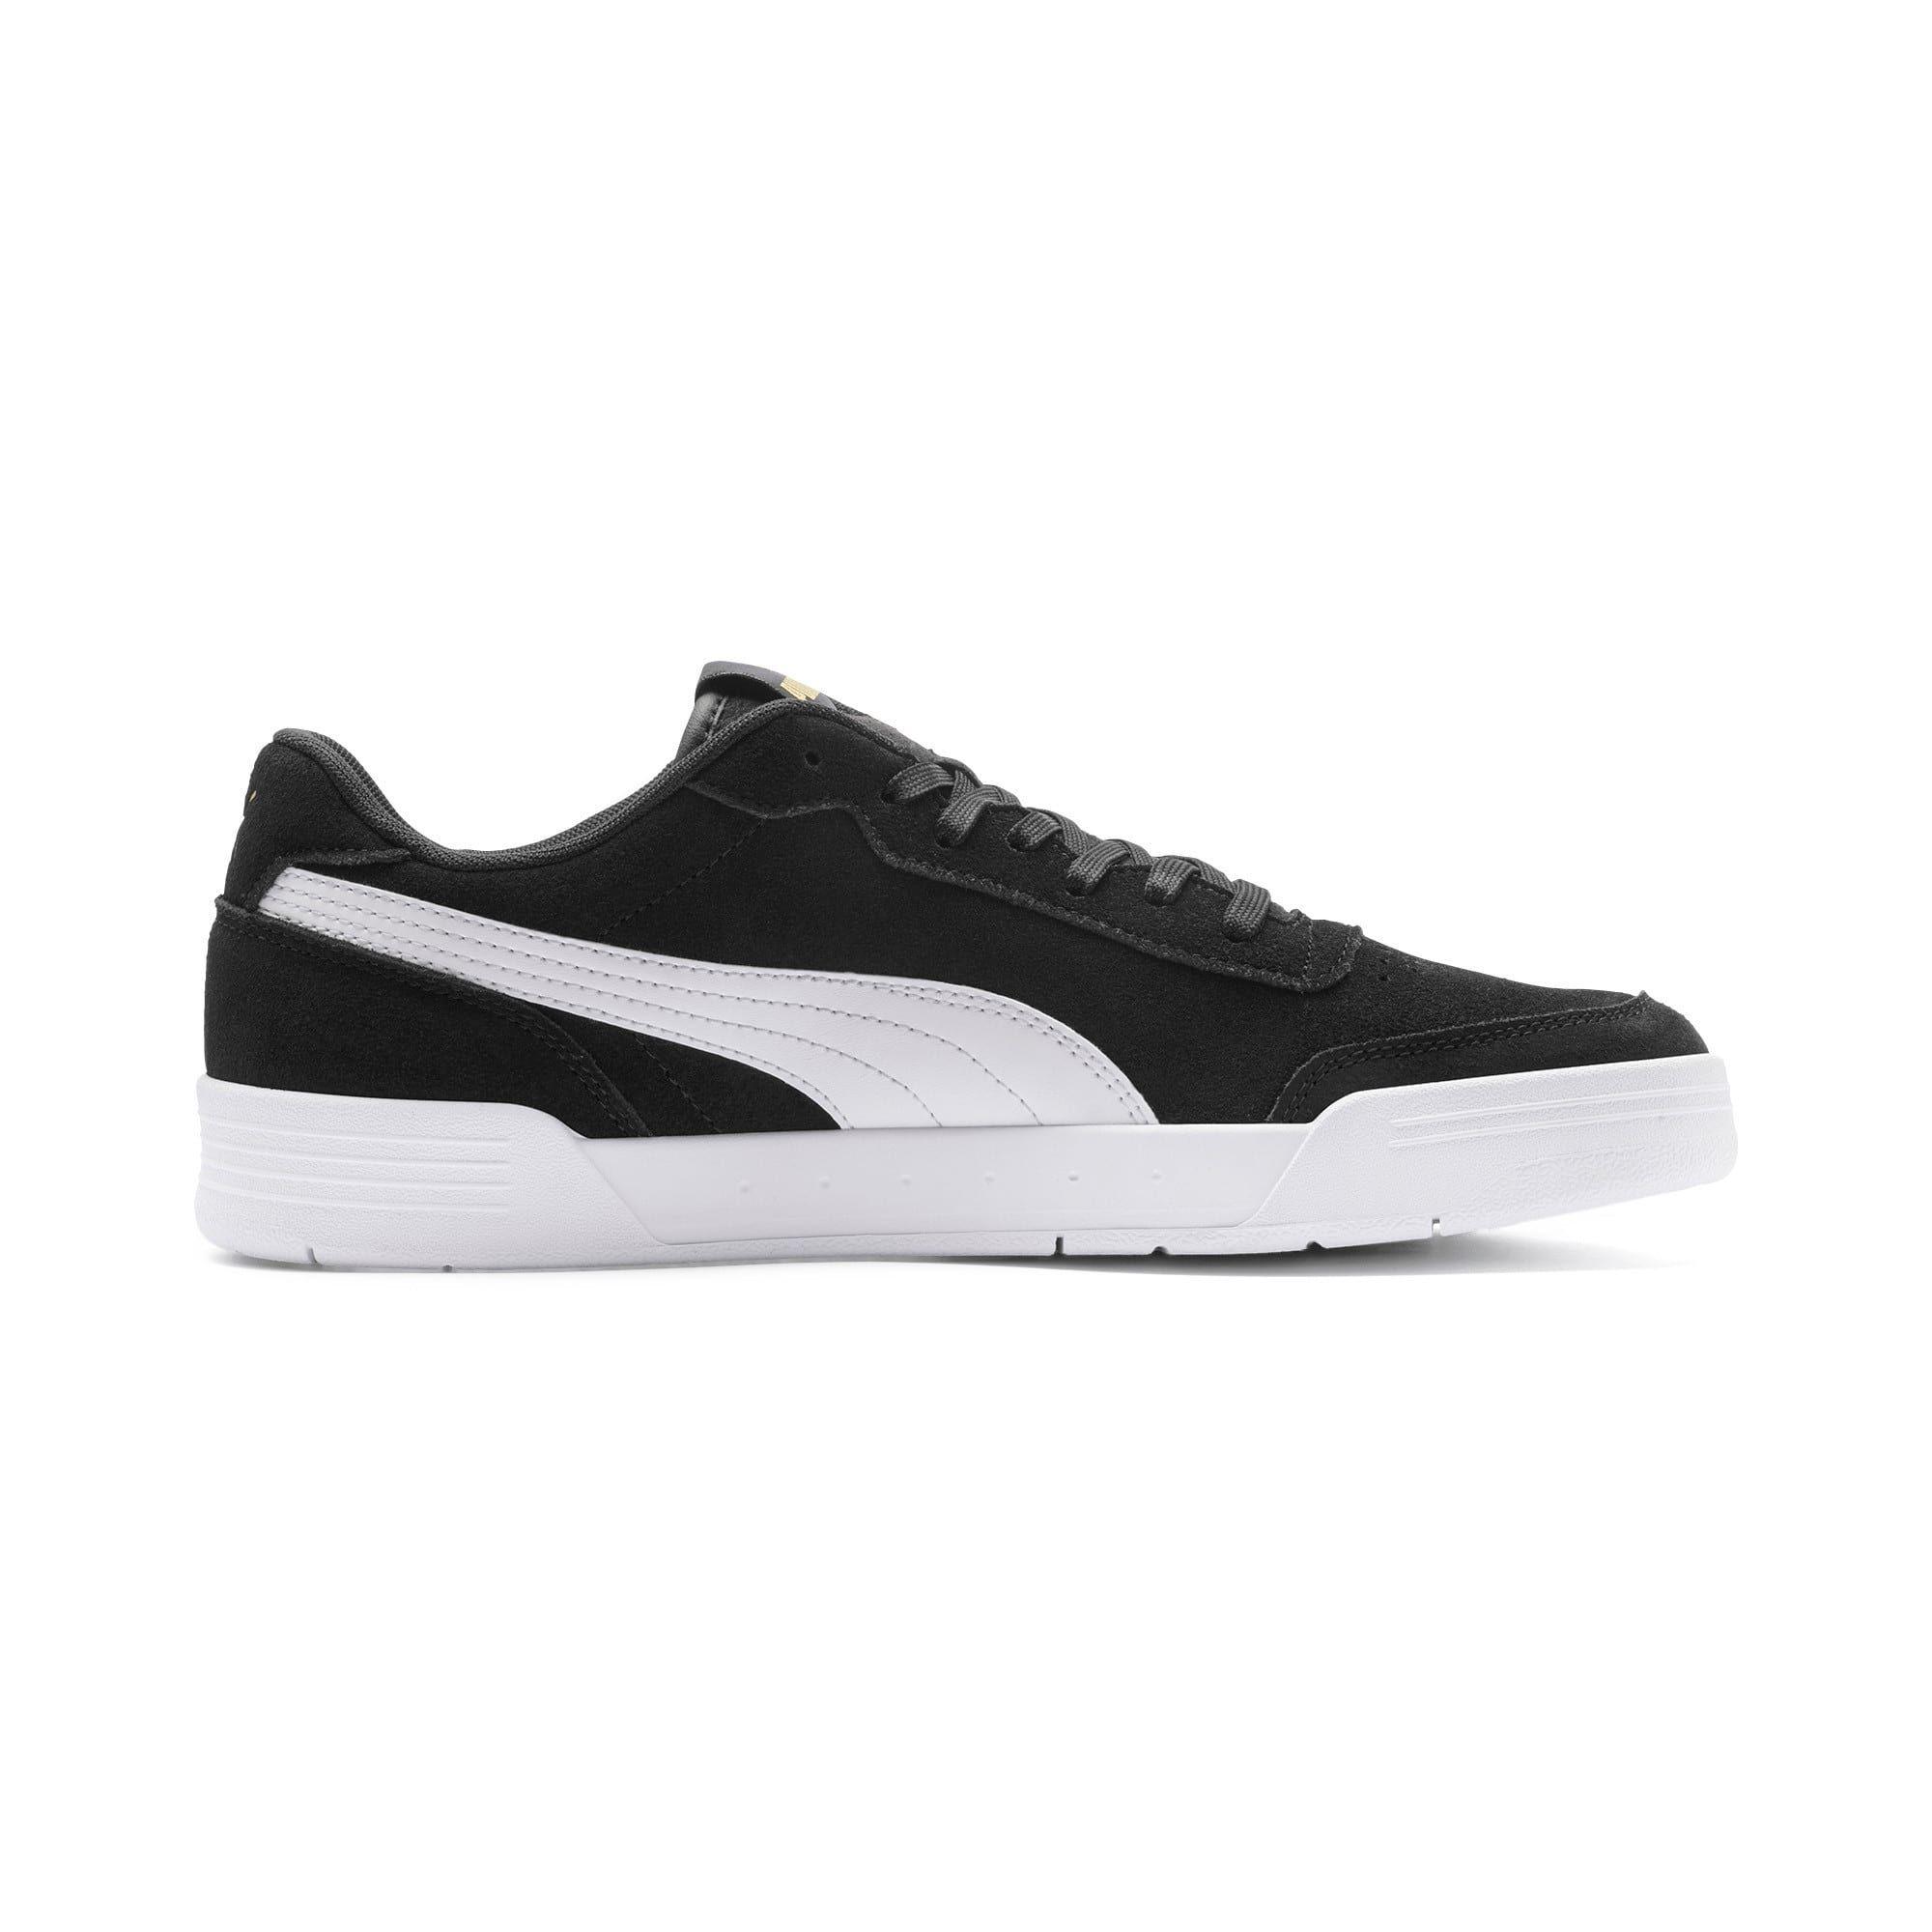 Puma Caracal Suede Freizeit Schuhe bei